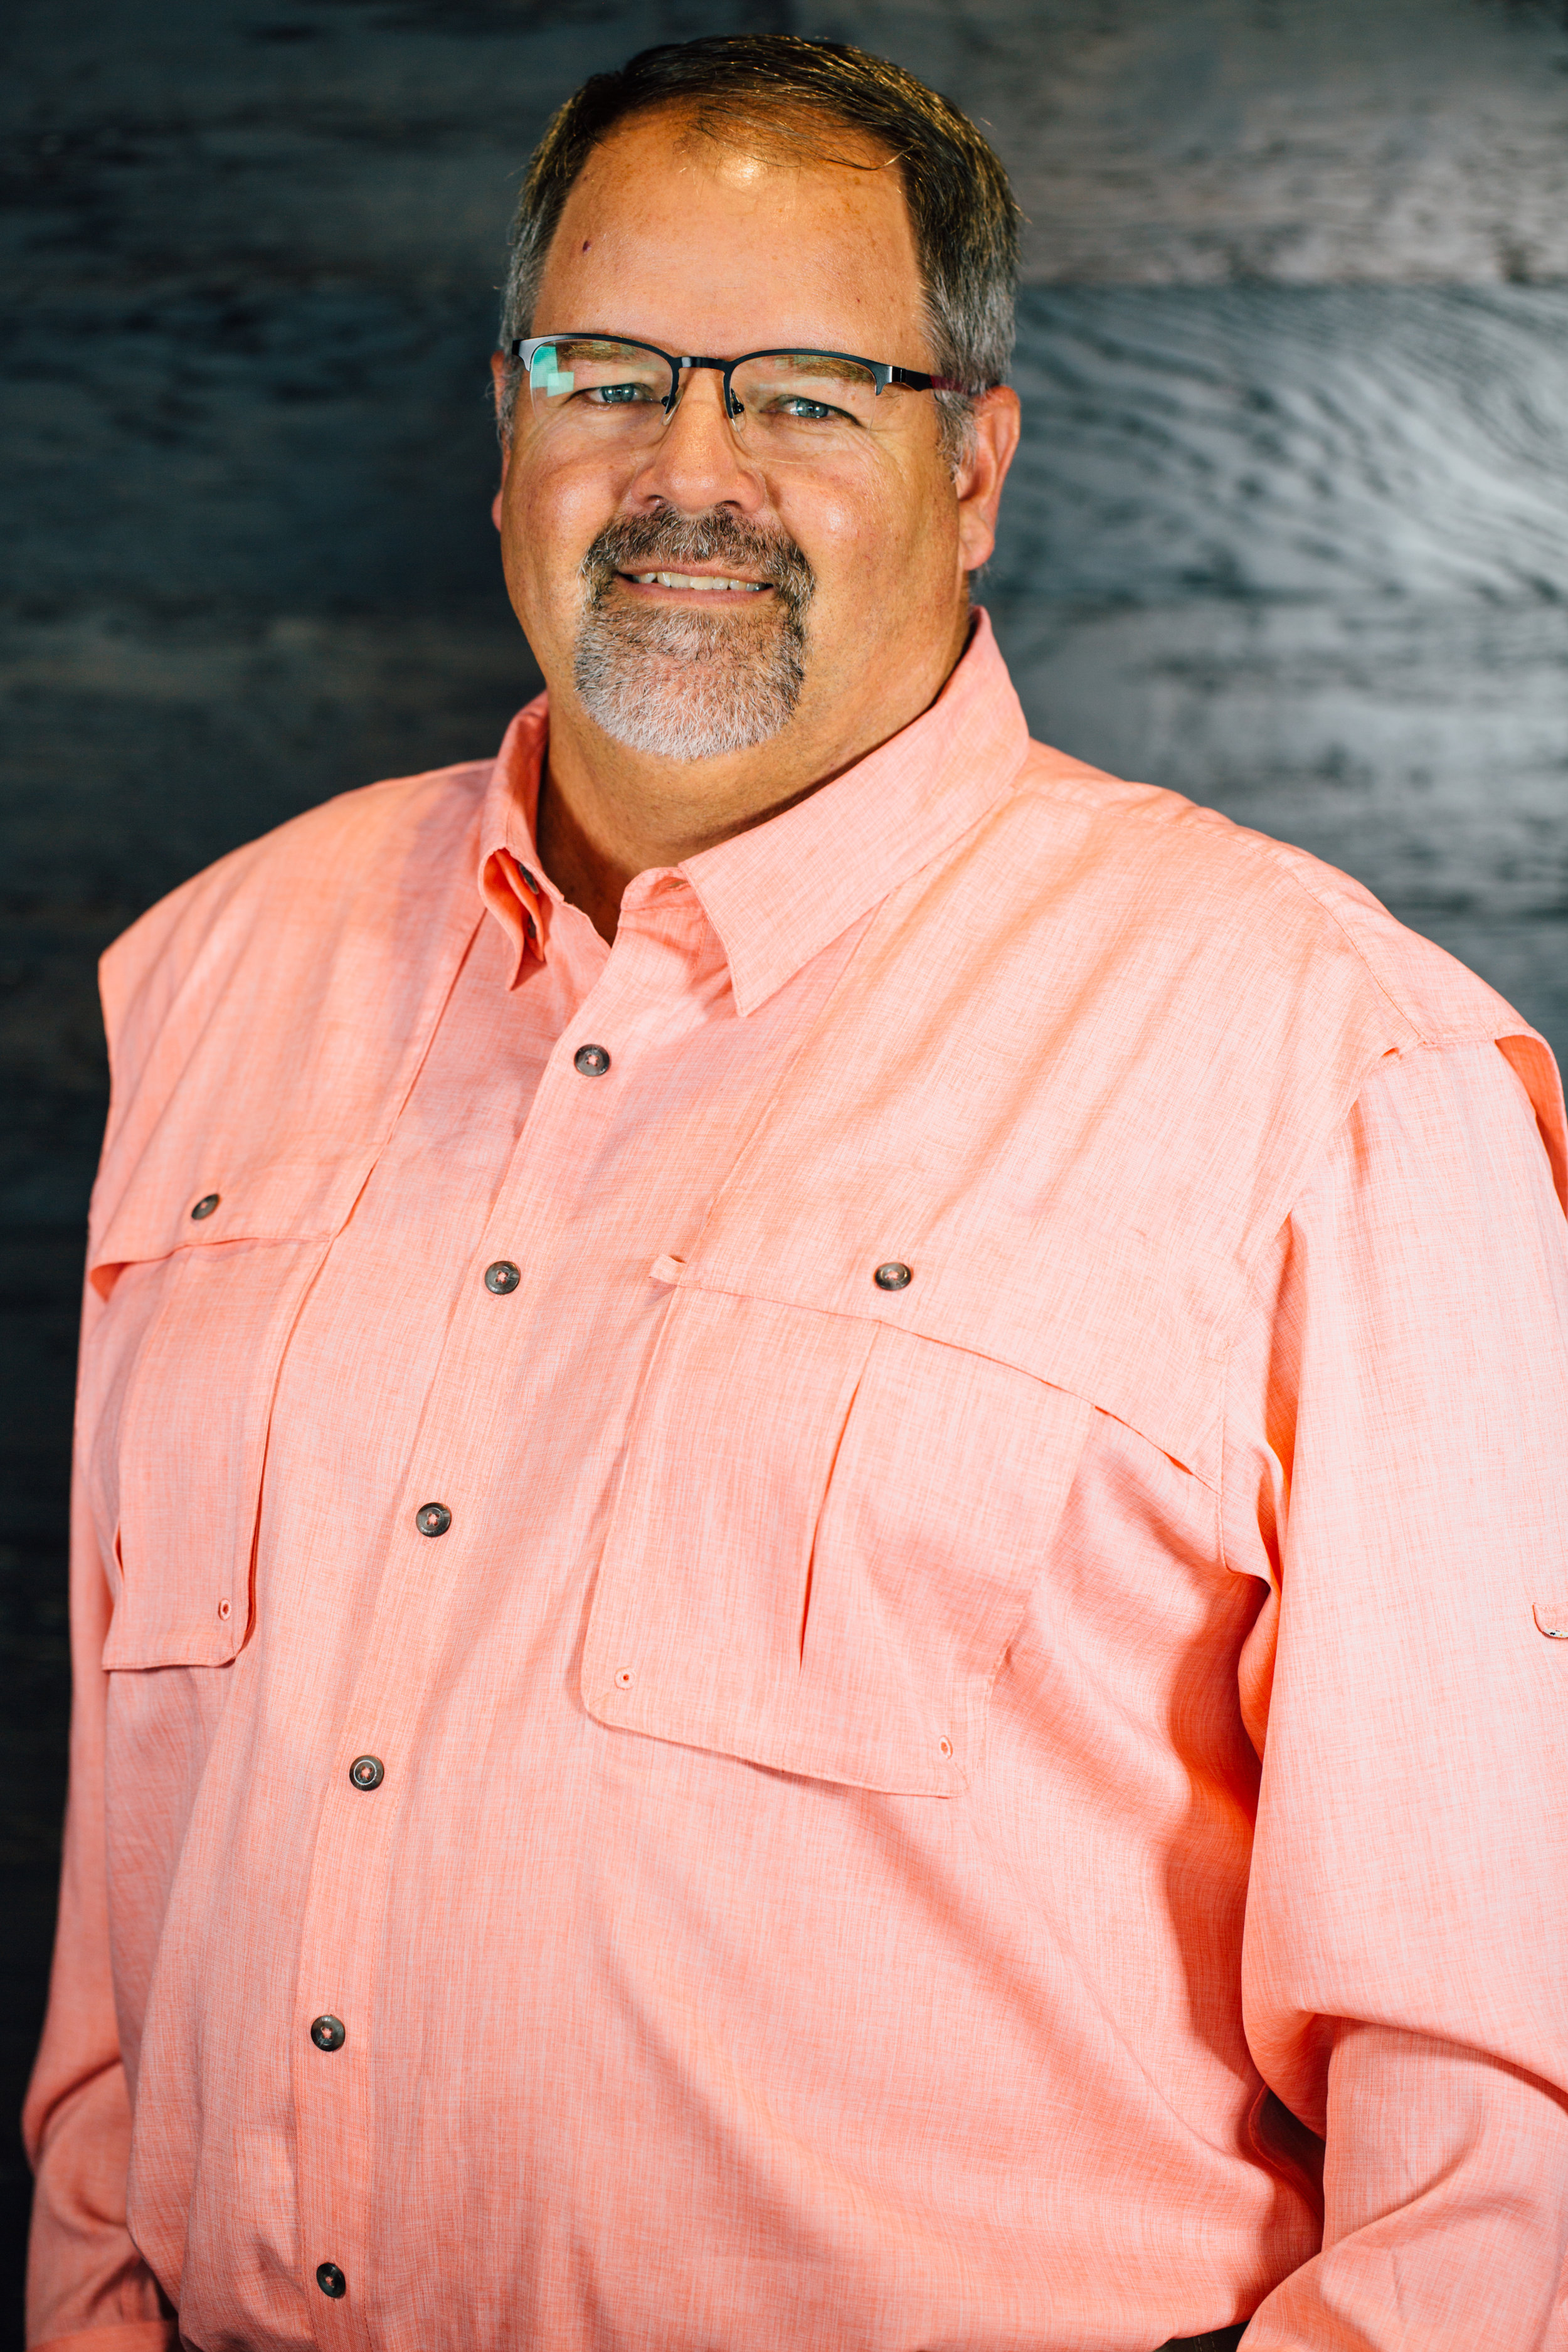 Jeff Selgeby - Stephen Ministry - jbselgeby@gmail.com